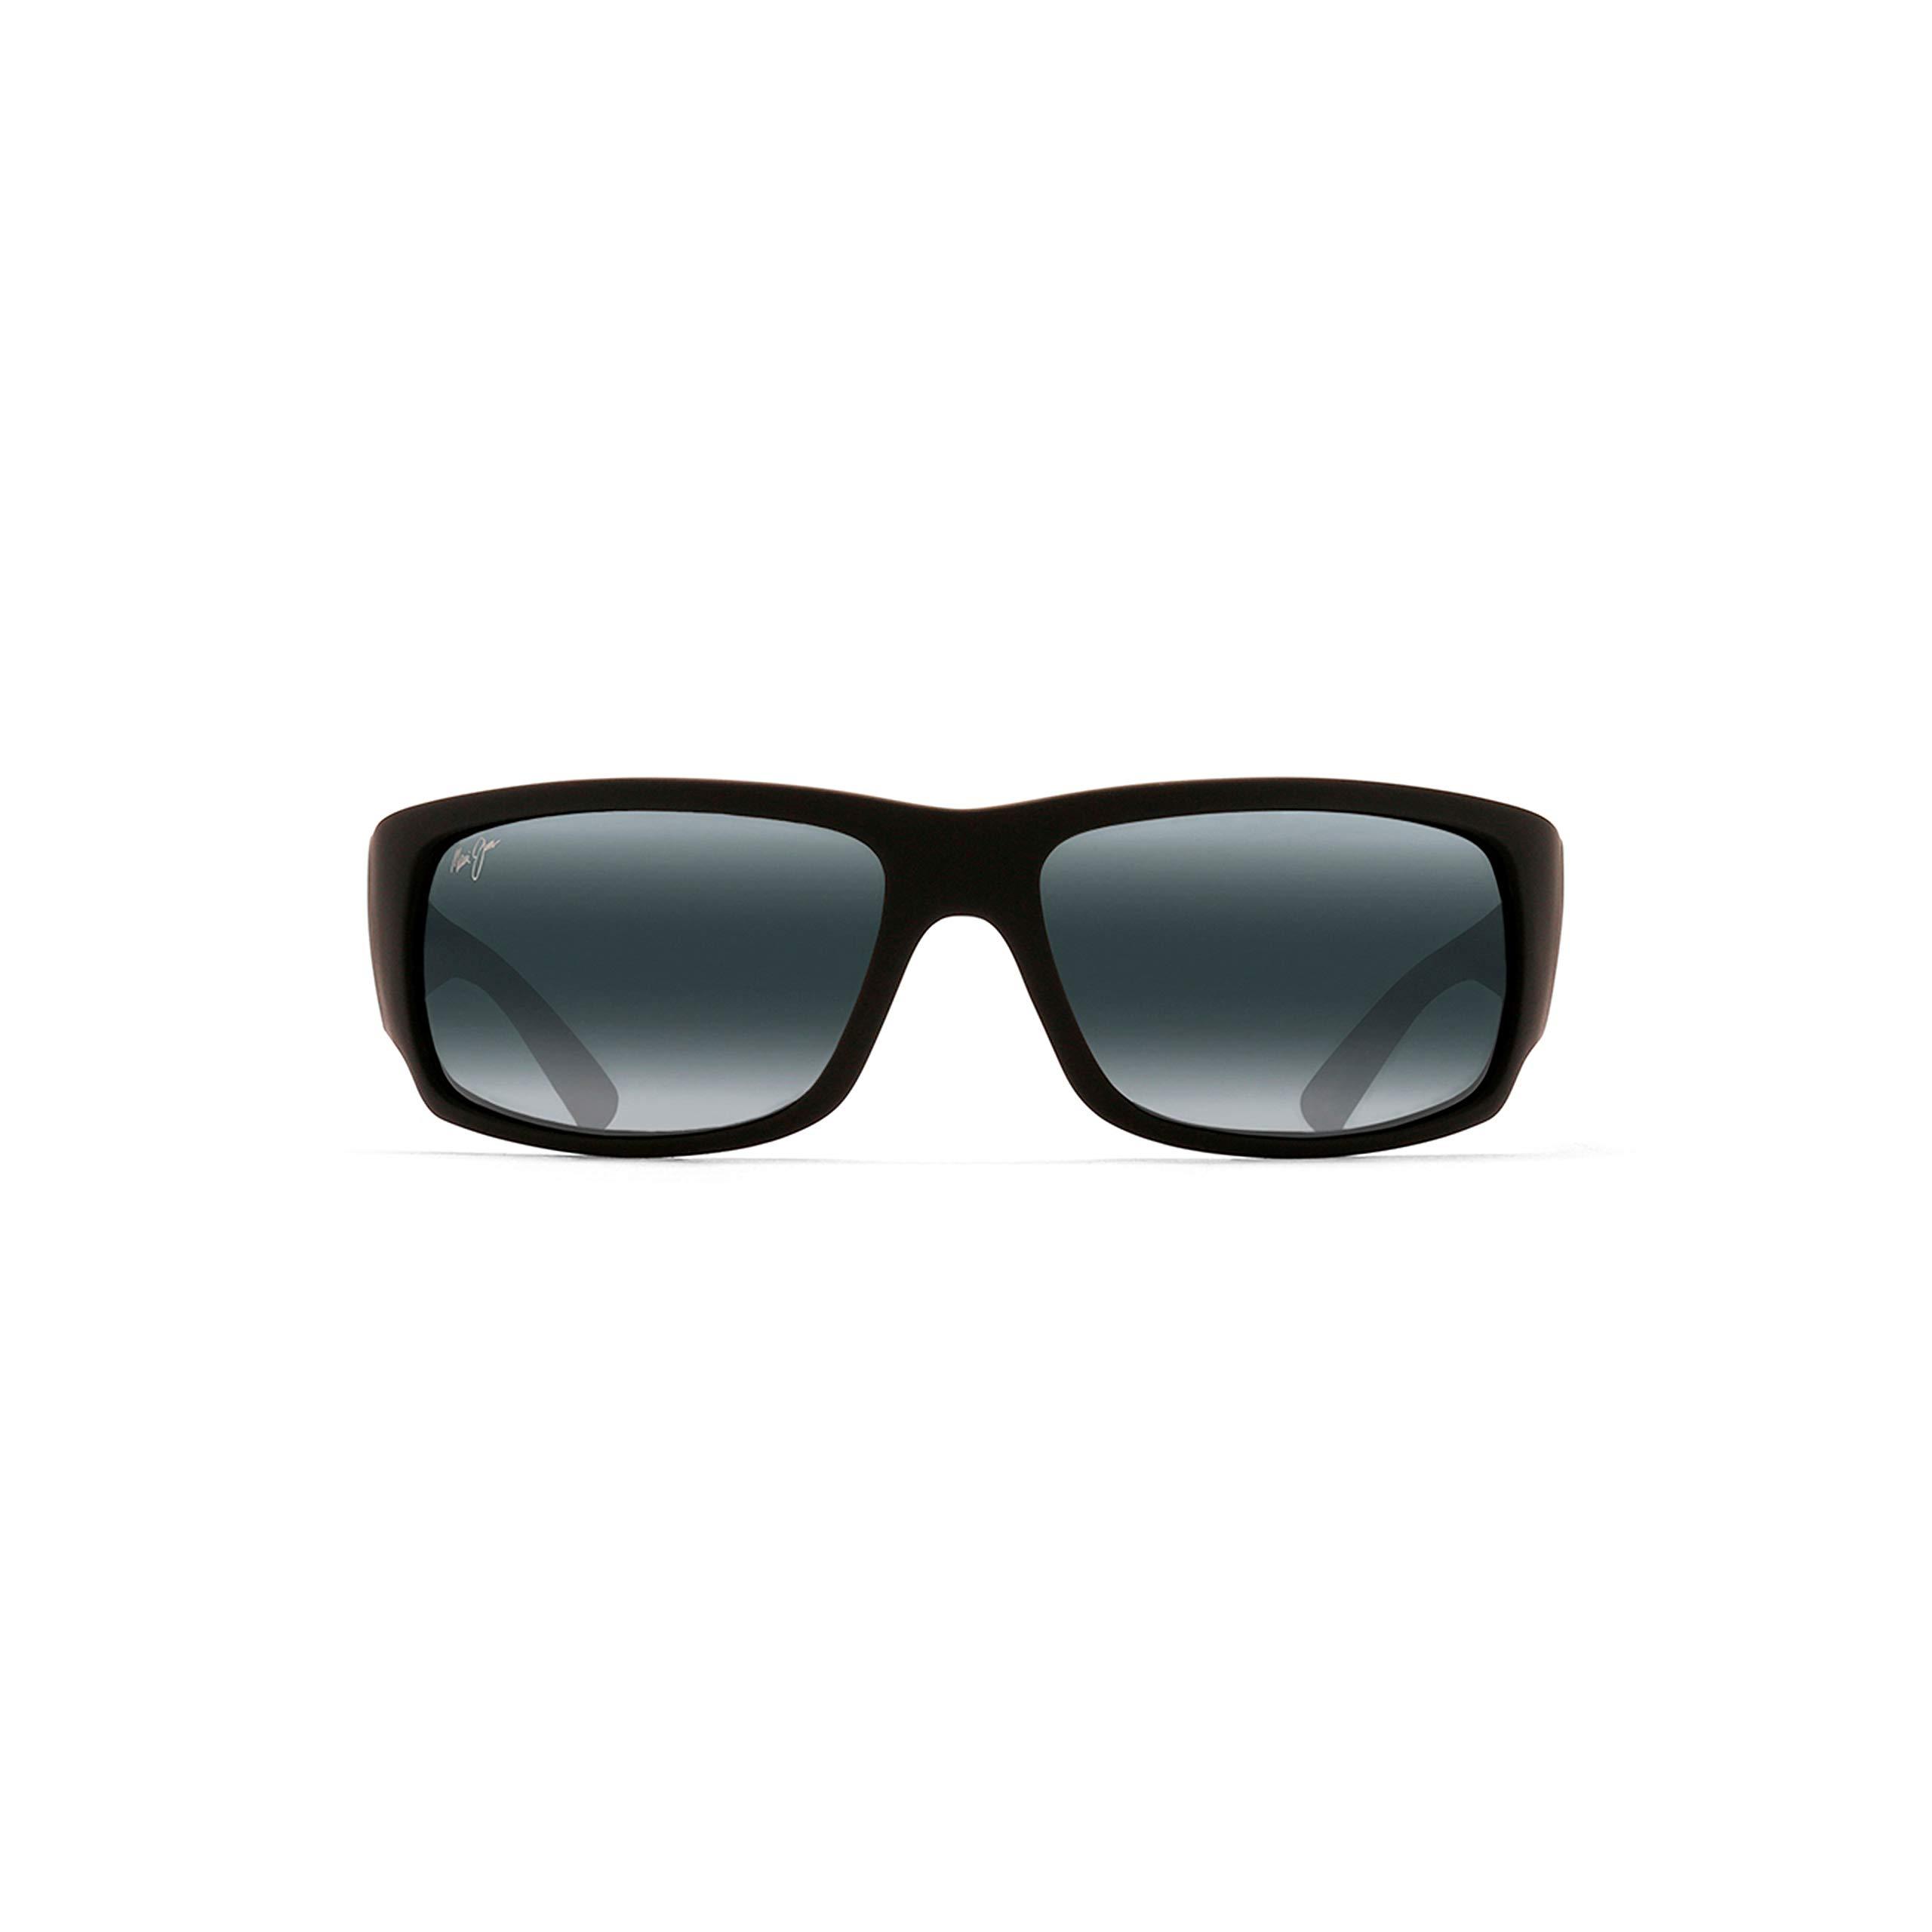 Maui Jim Sunglasses | World Cup 266-02MR, Matte Black Rubber, with Patented PolarizedPlus2 Lens Technology by Maui Jim